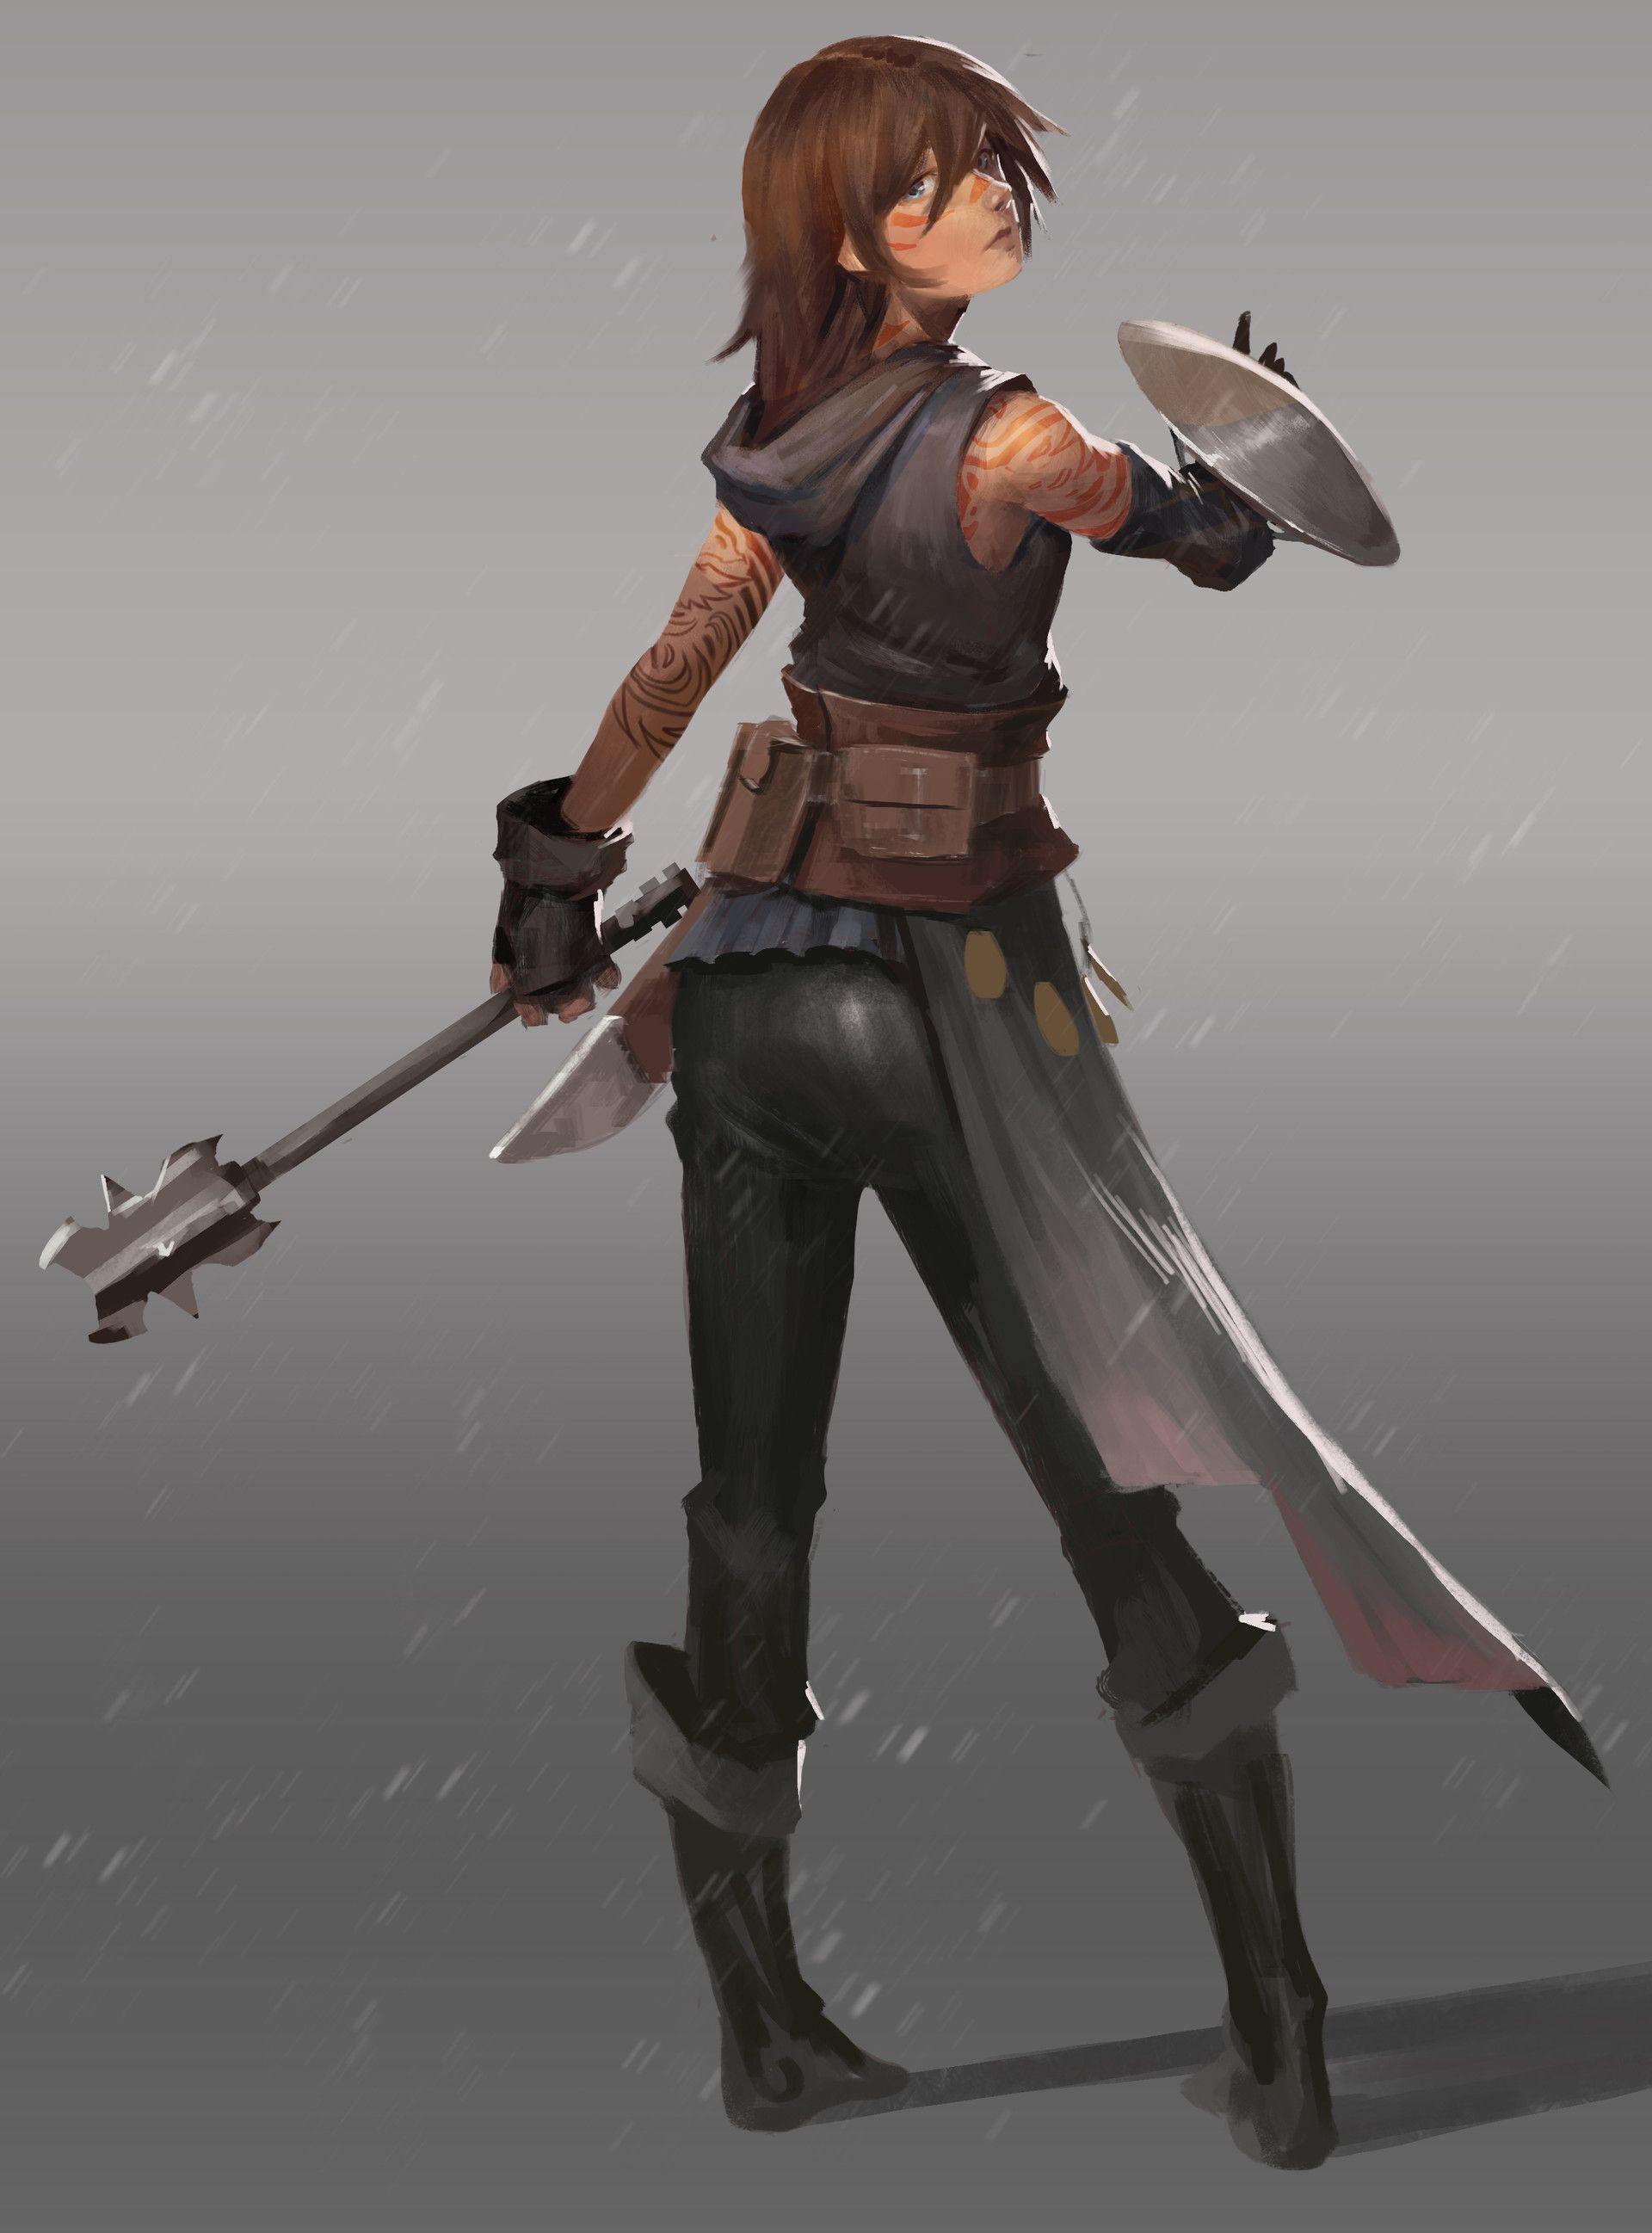 Noob Mage By Joshcorpuz85 Female Druid Witch Sorceress: ArtStation - Noob Adventurers, Josh Corpuz